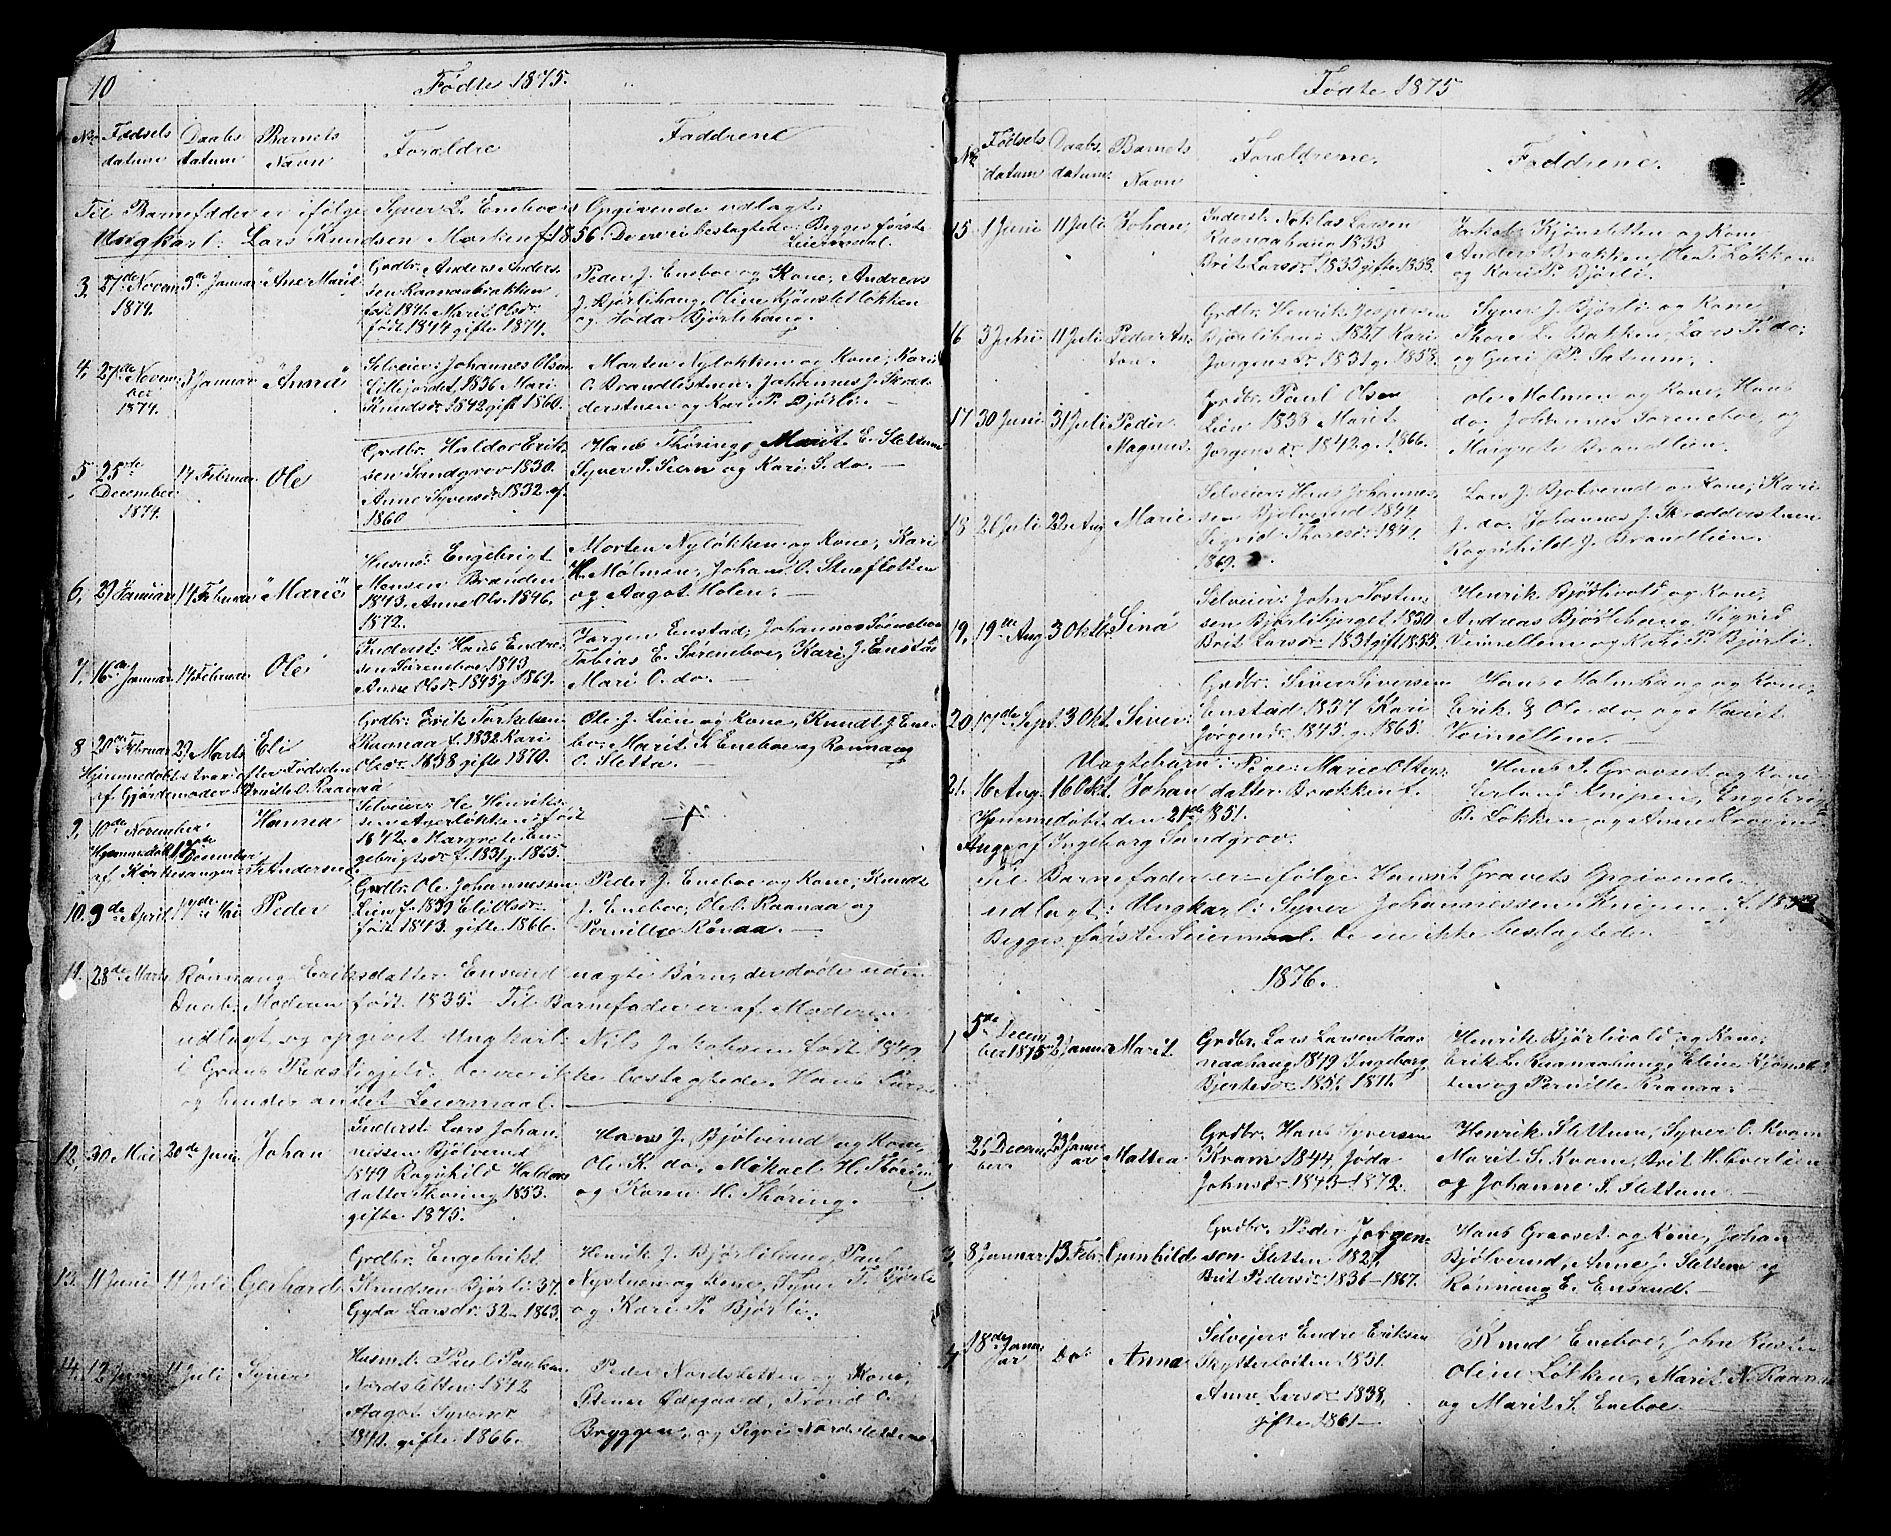 SAH, Lesja prestekontor, Klokkerbok nr. 6, 1871-1904, s. 10-11